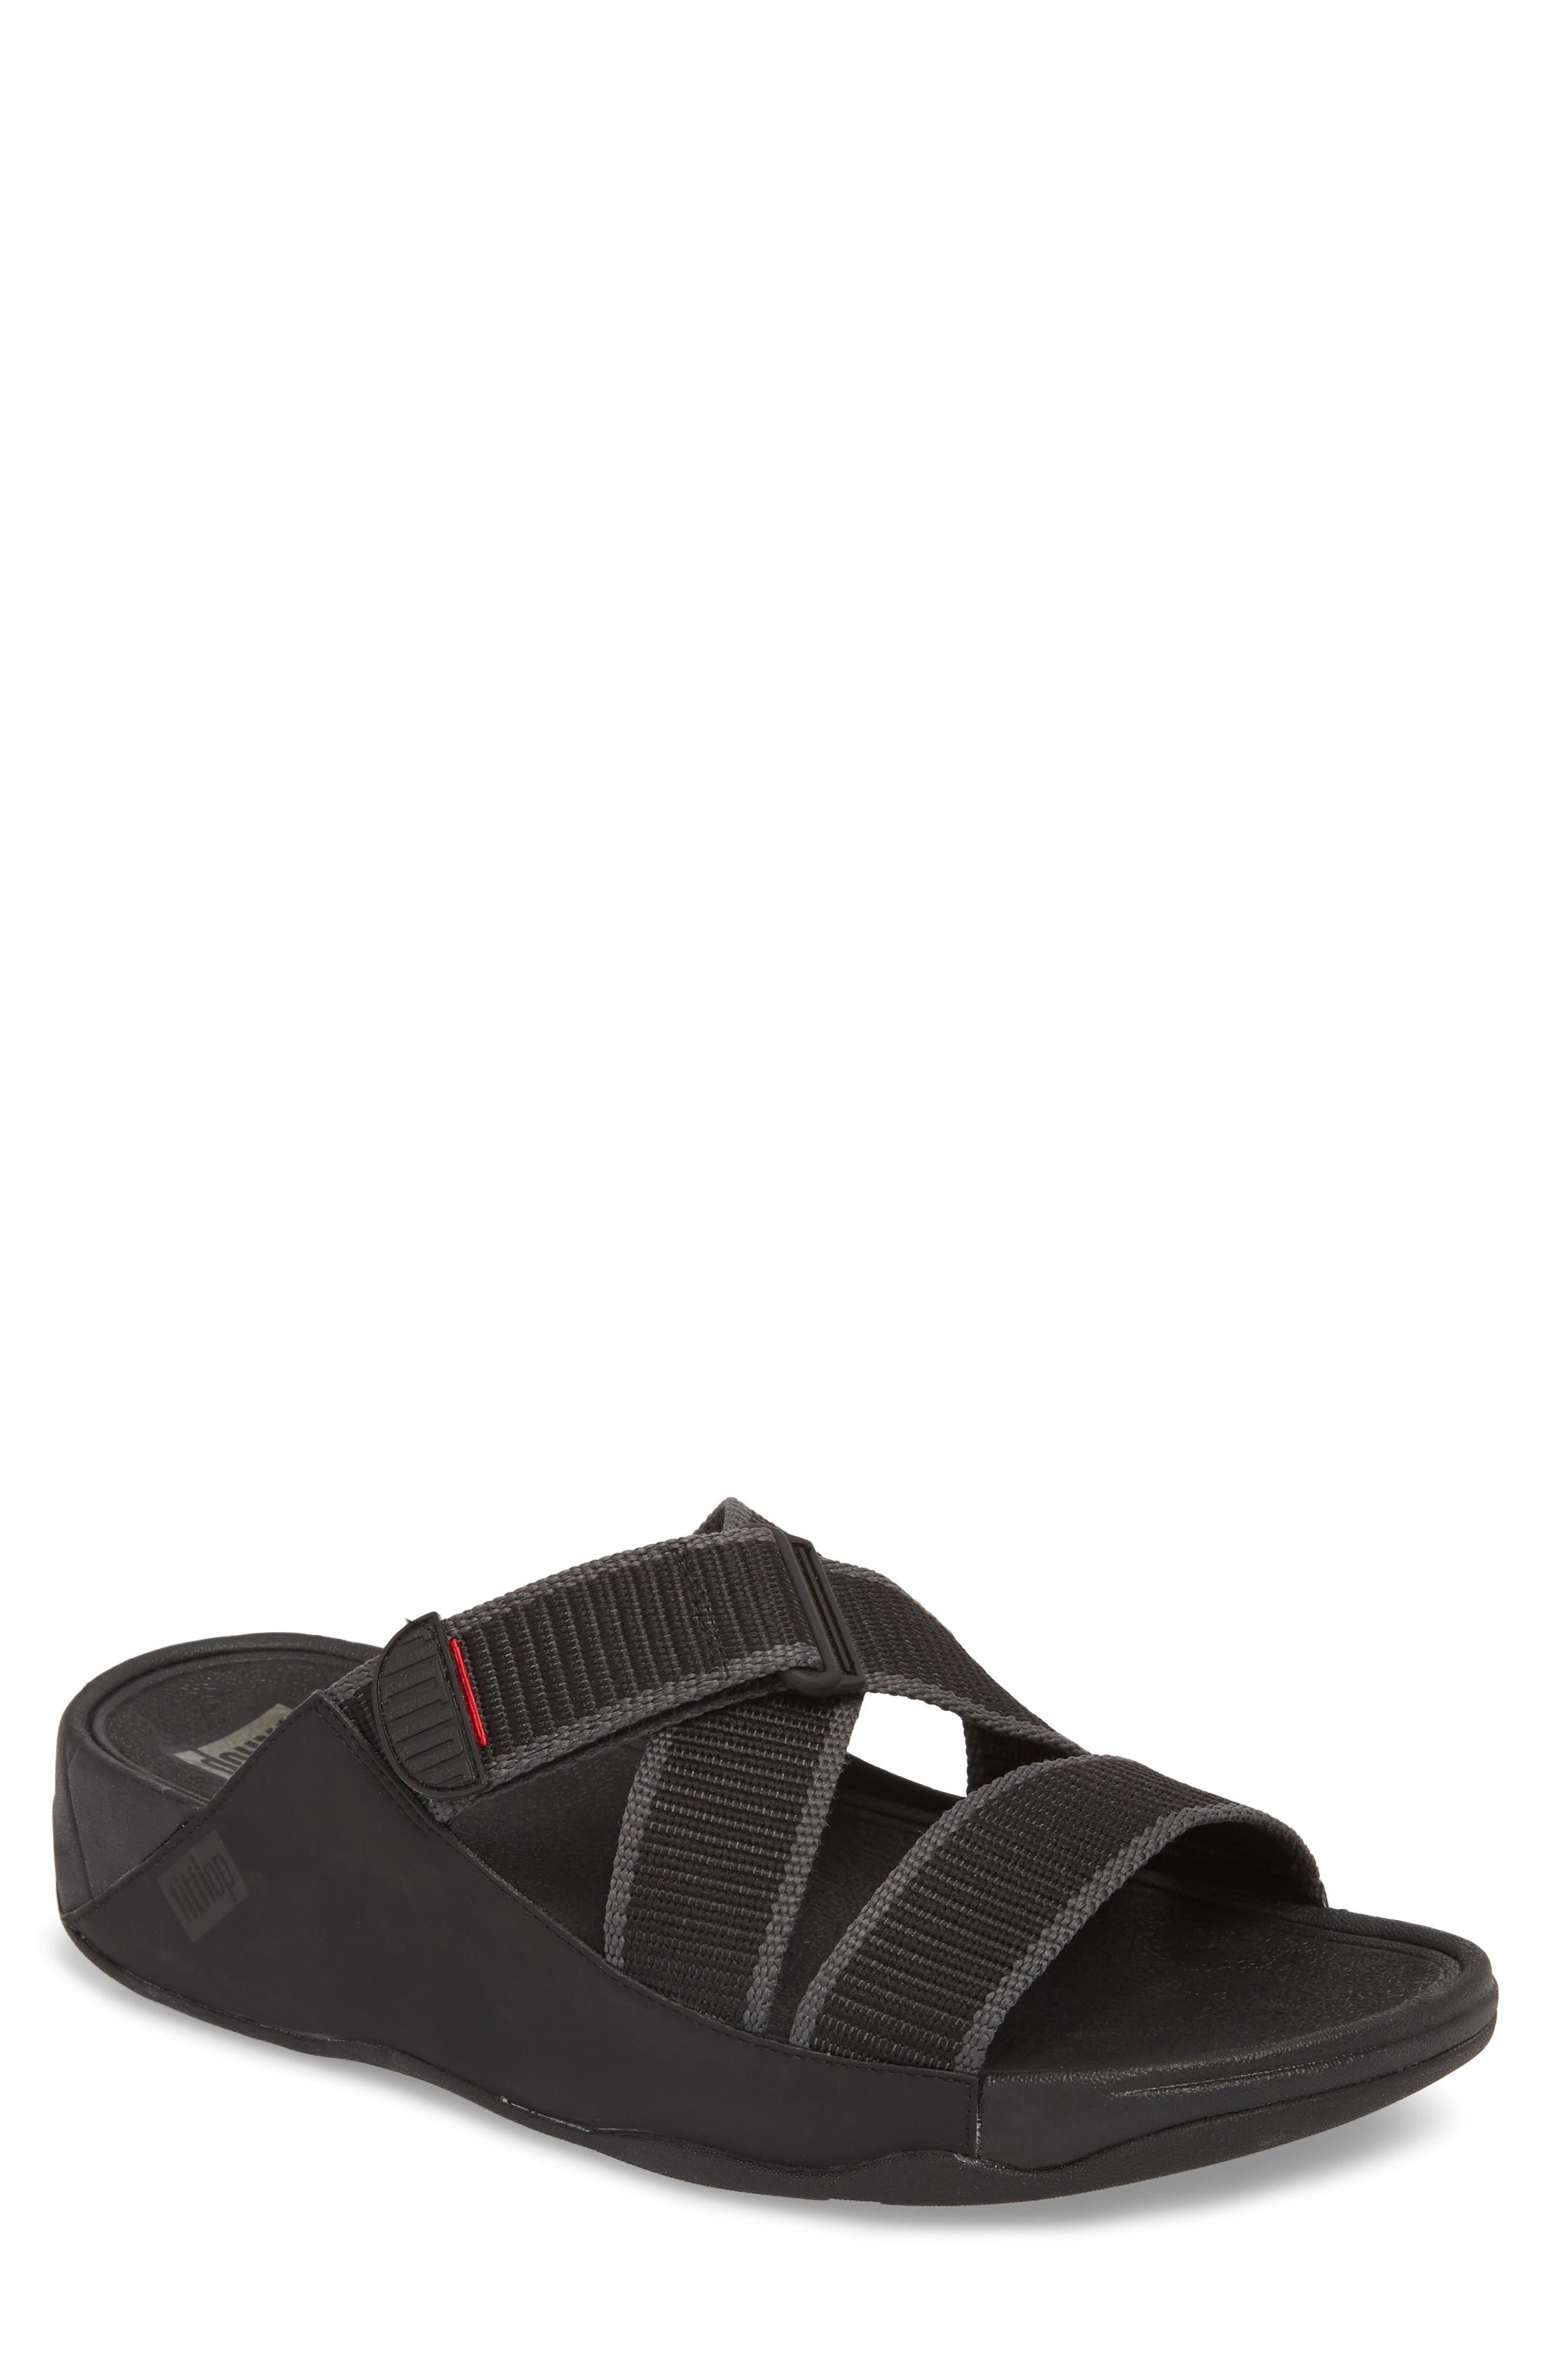 Sling II Slide Sandal,                             Main thumbnail 1, color,                             BLACK/ DARK SHADOW